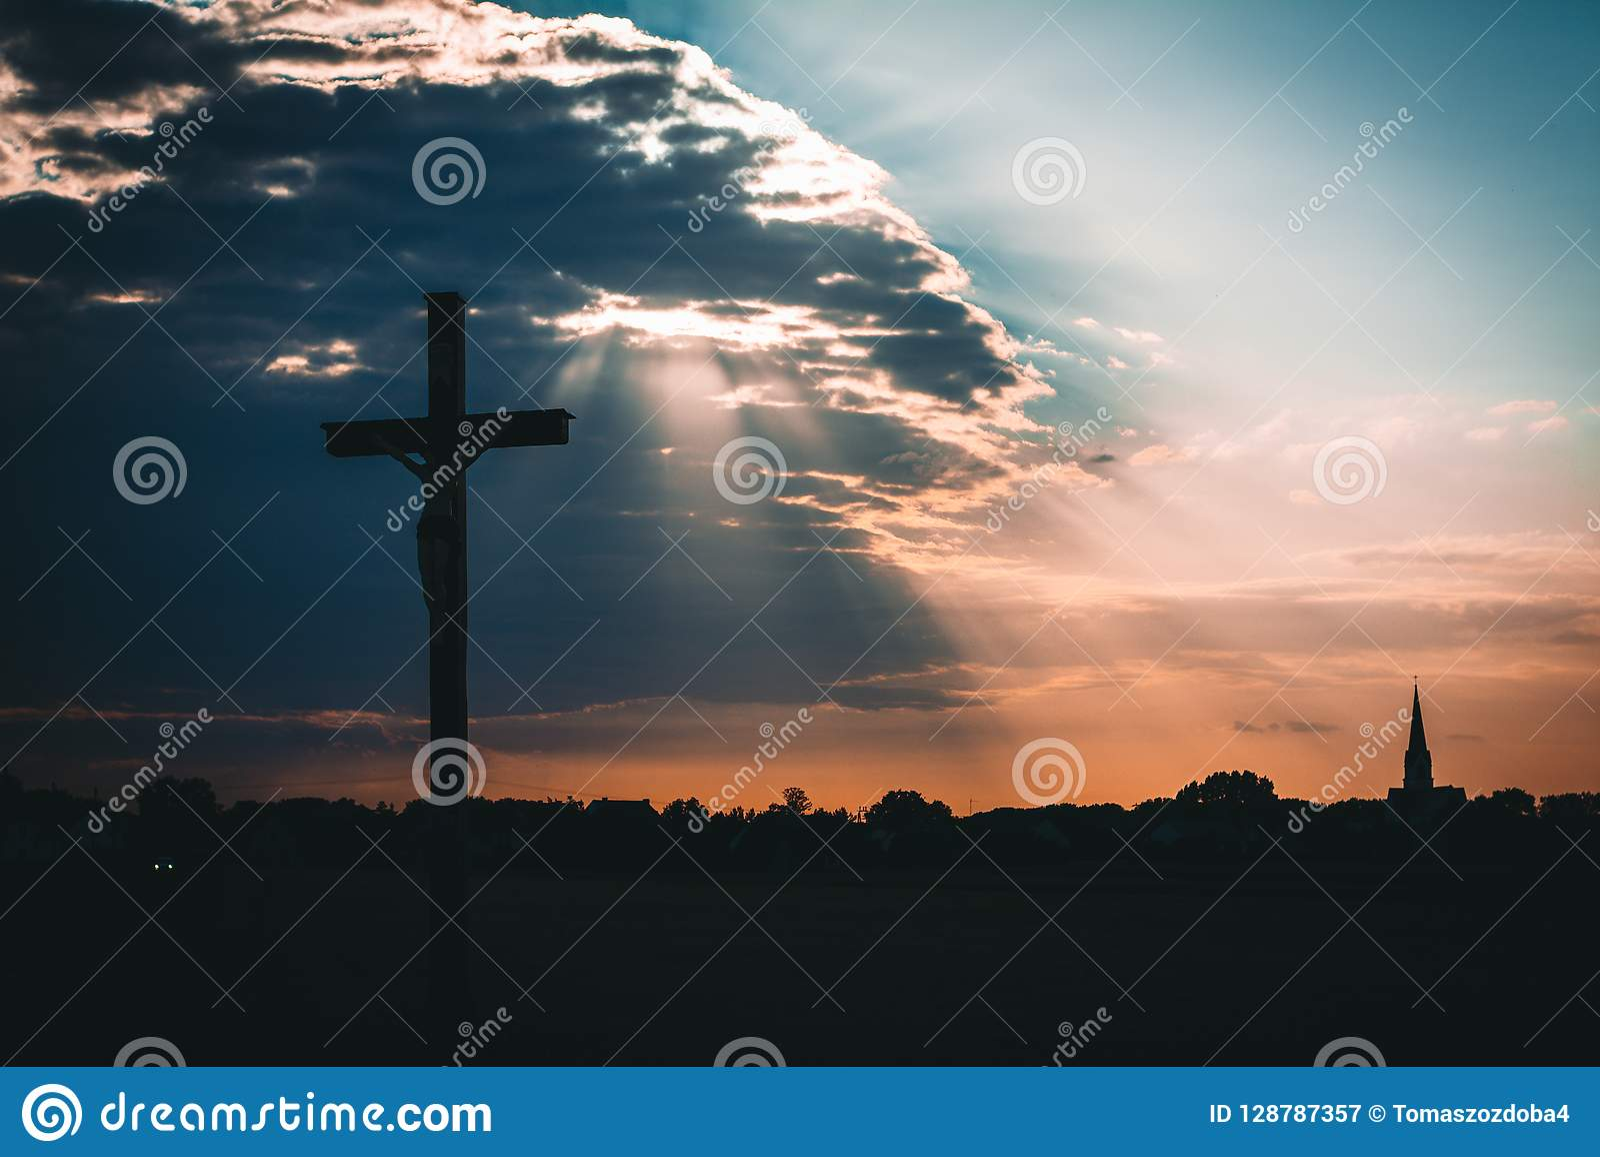 Jesus Christ On Cross Sunset Stock Image Image Of Silhouette